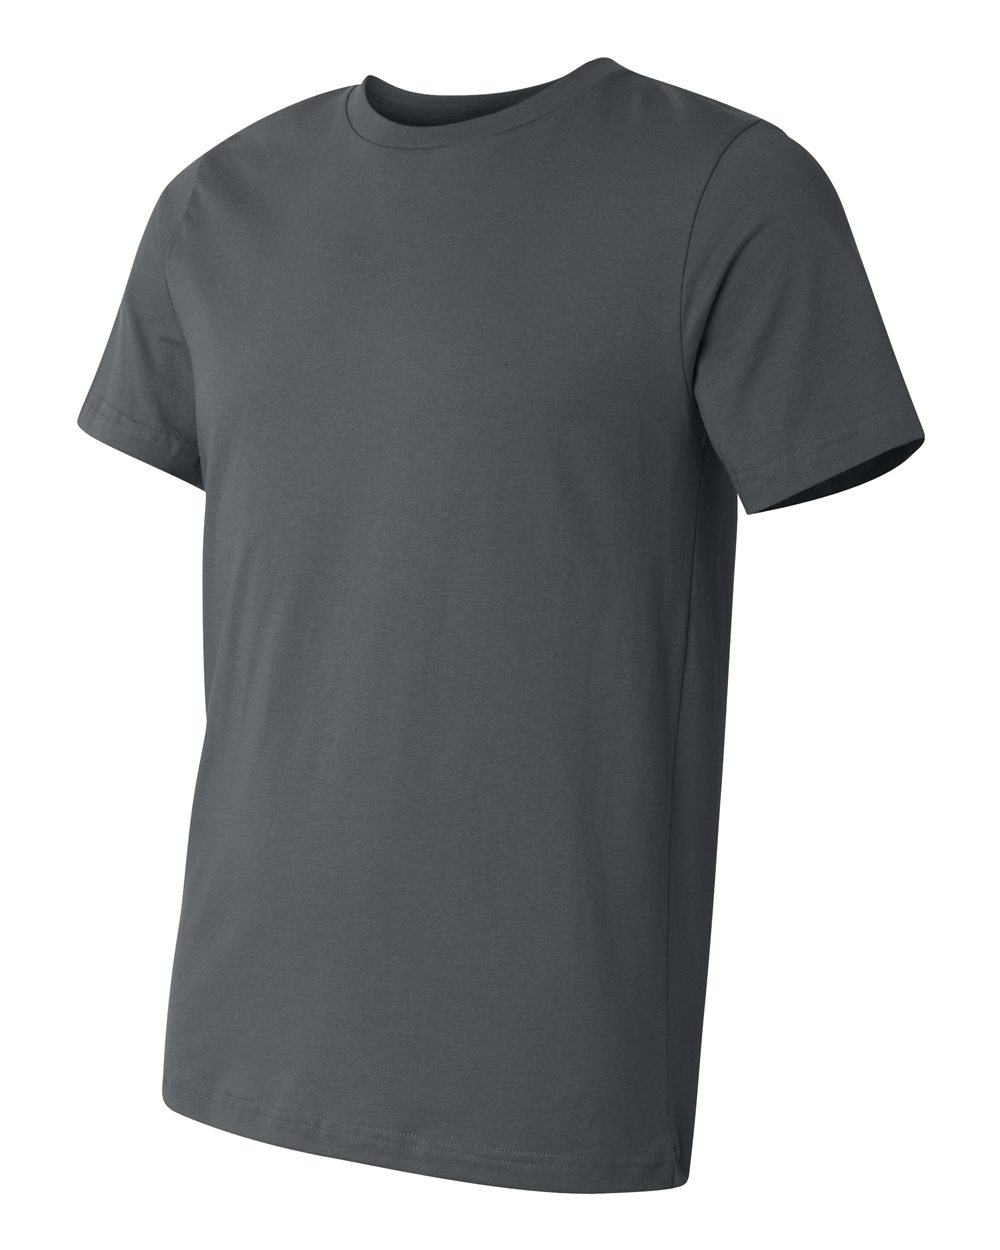 Bella-Canvas-Unisex-Made-in-USA-Jersey-Short-Sleeve-T-Shirt-3001U-XS-3XL thumbnail 3